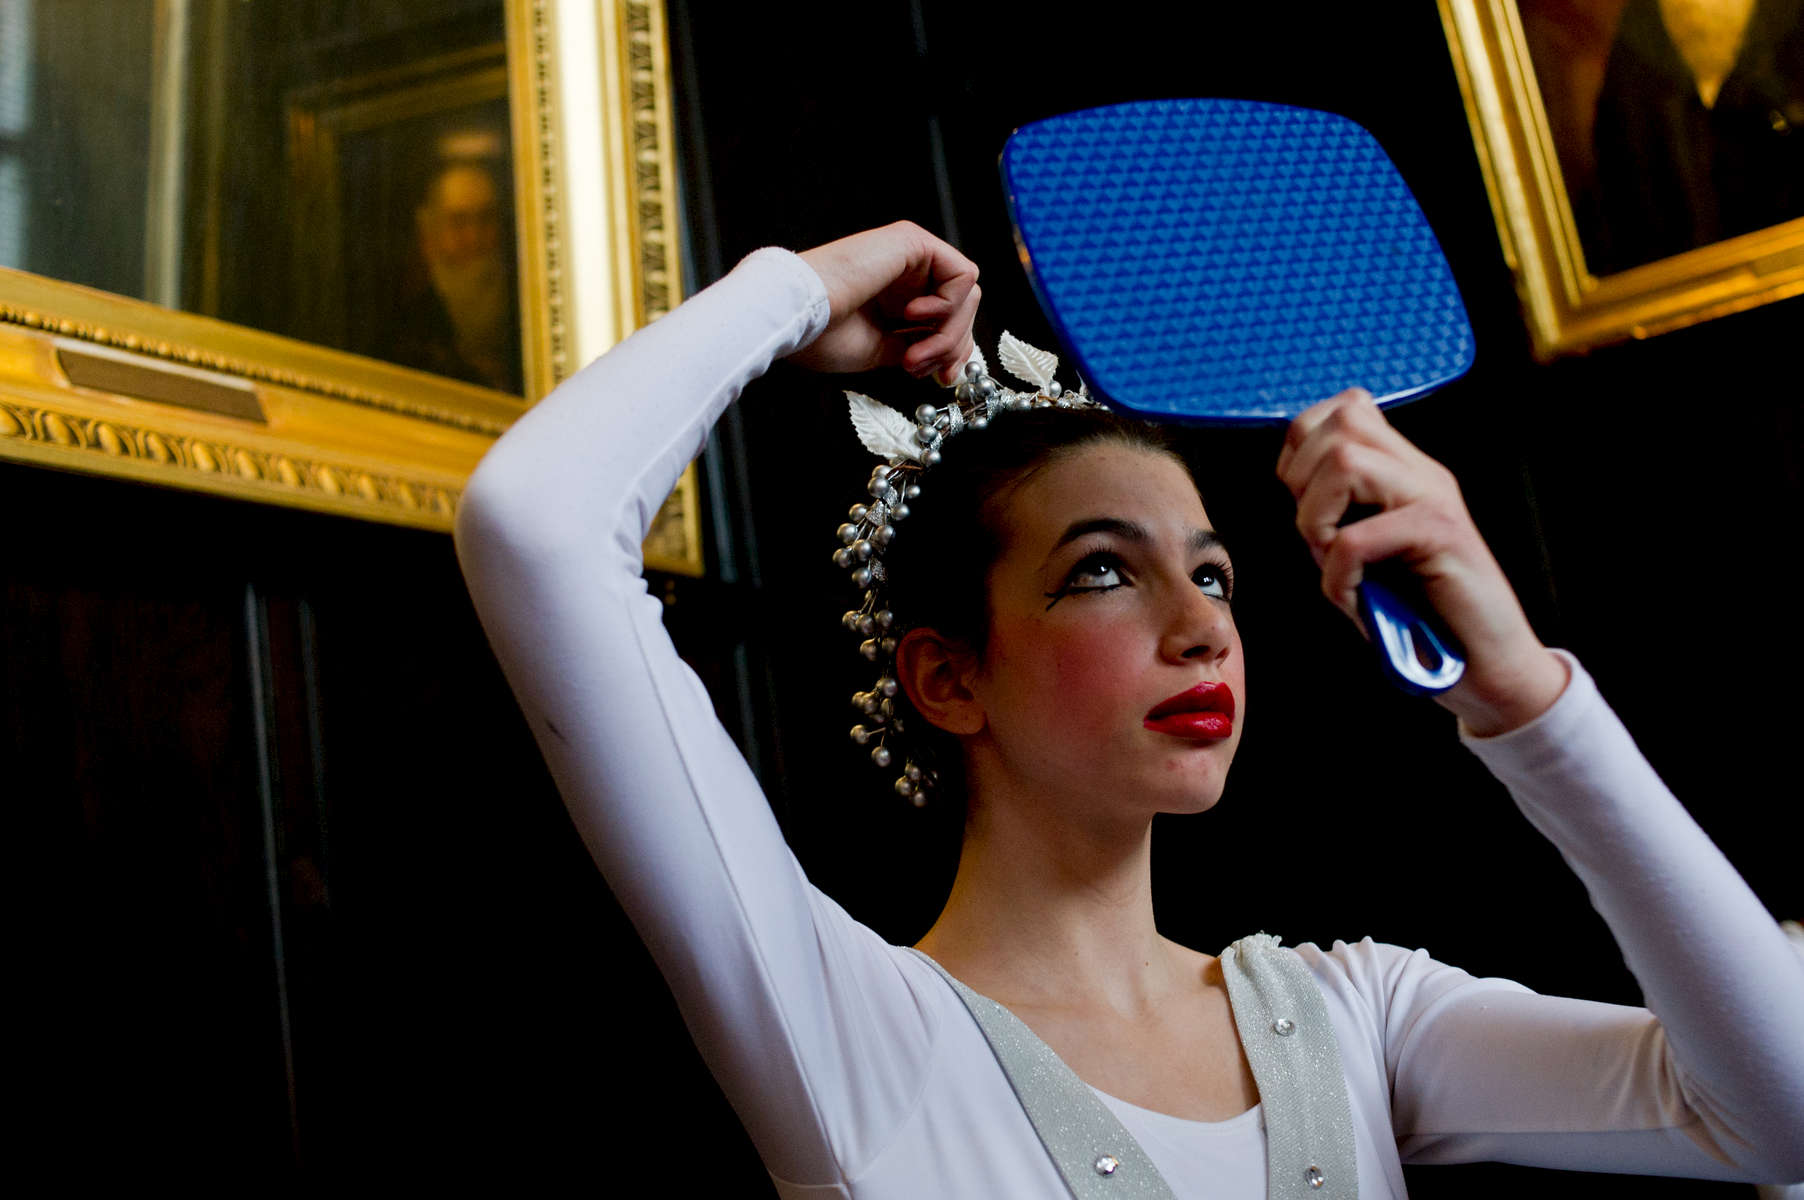 A Hyde Park School of Dance student prepares for the Nutcracker.